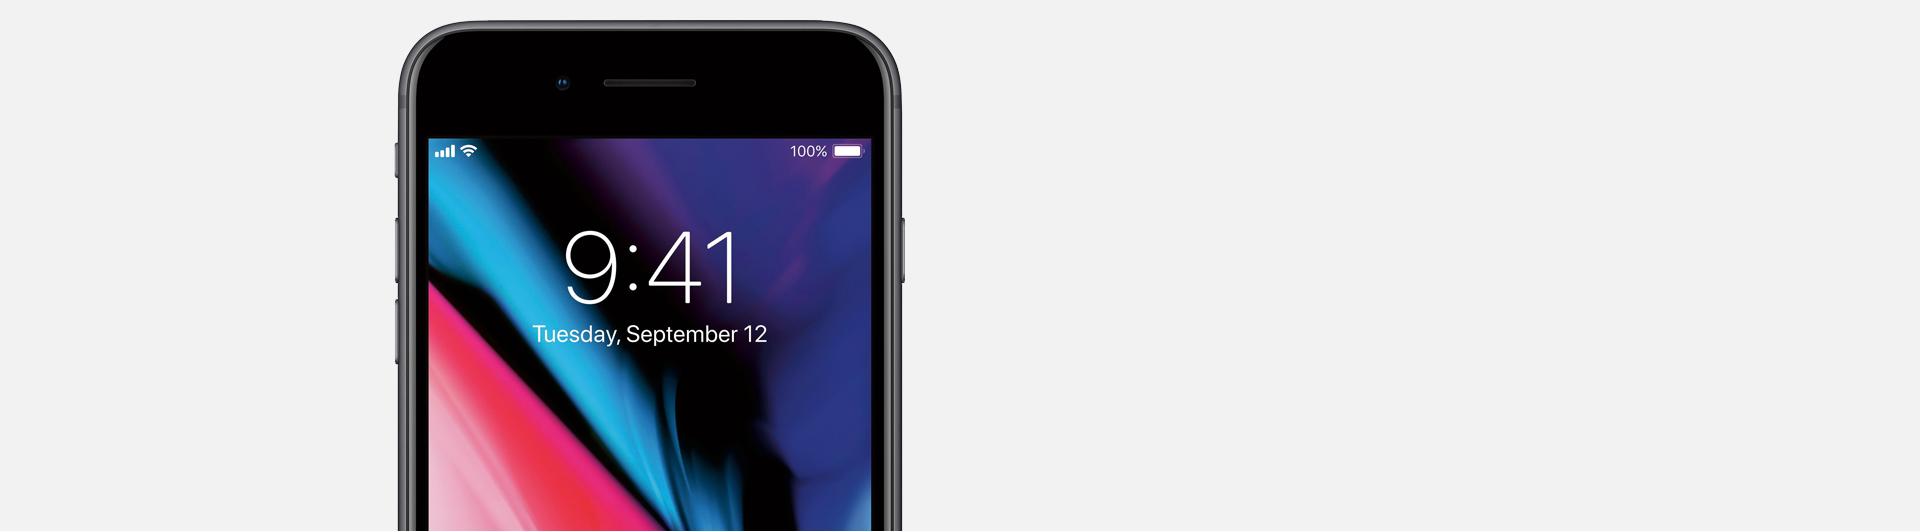 iPhone 8 256GB Gray camera cực sắc nét